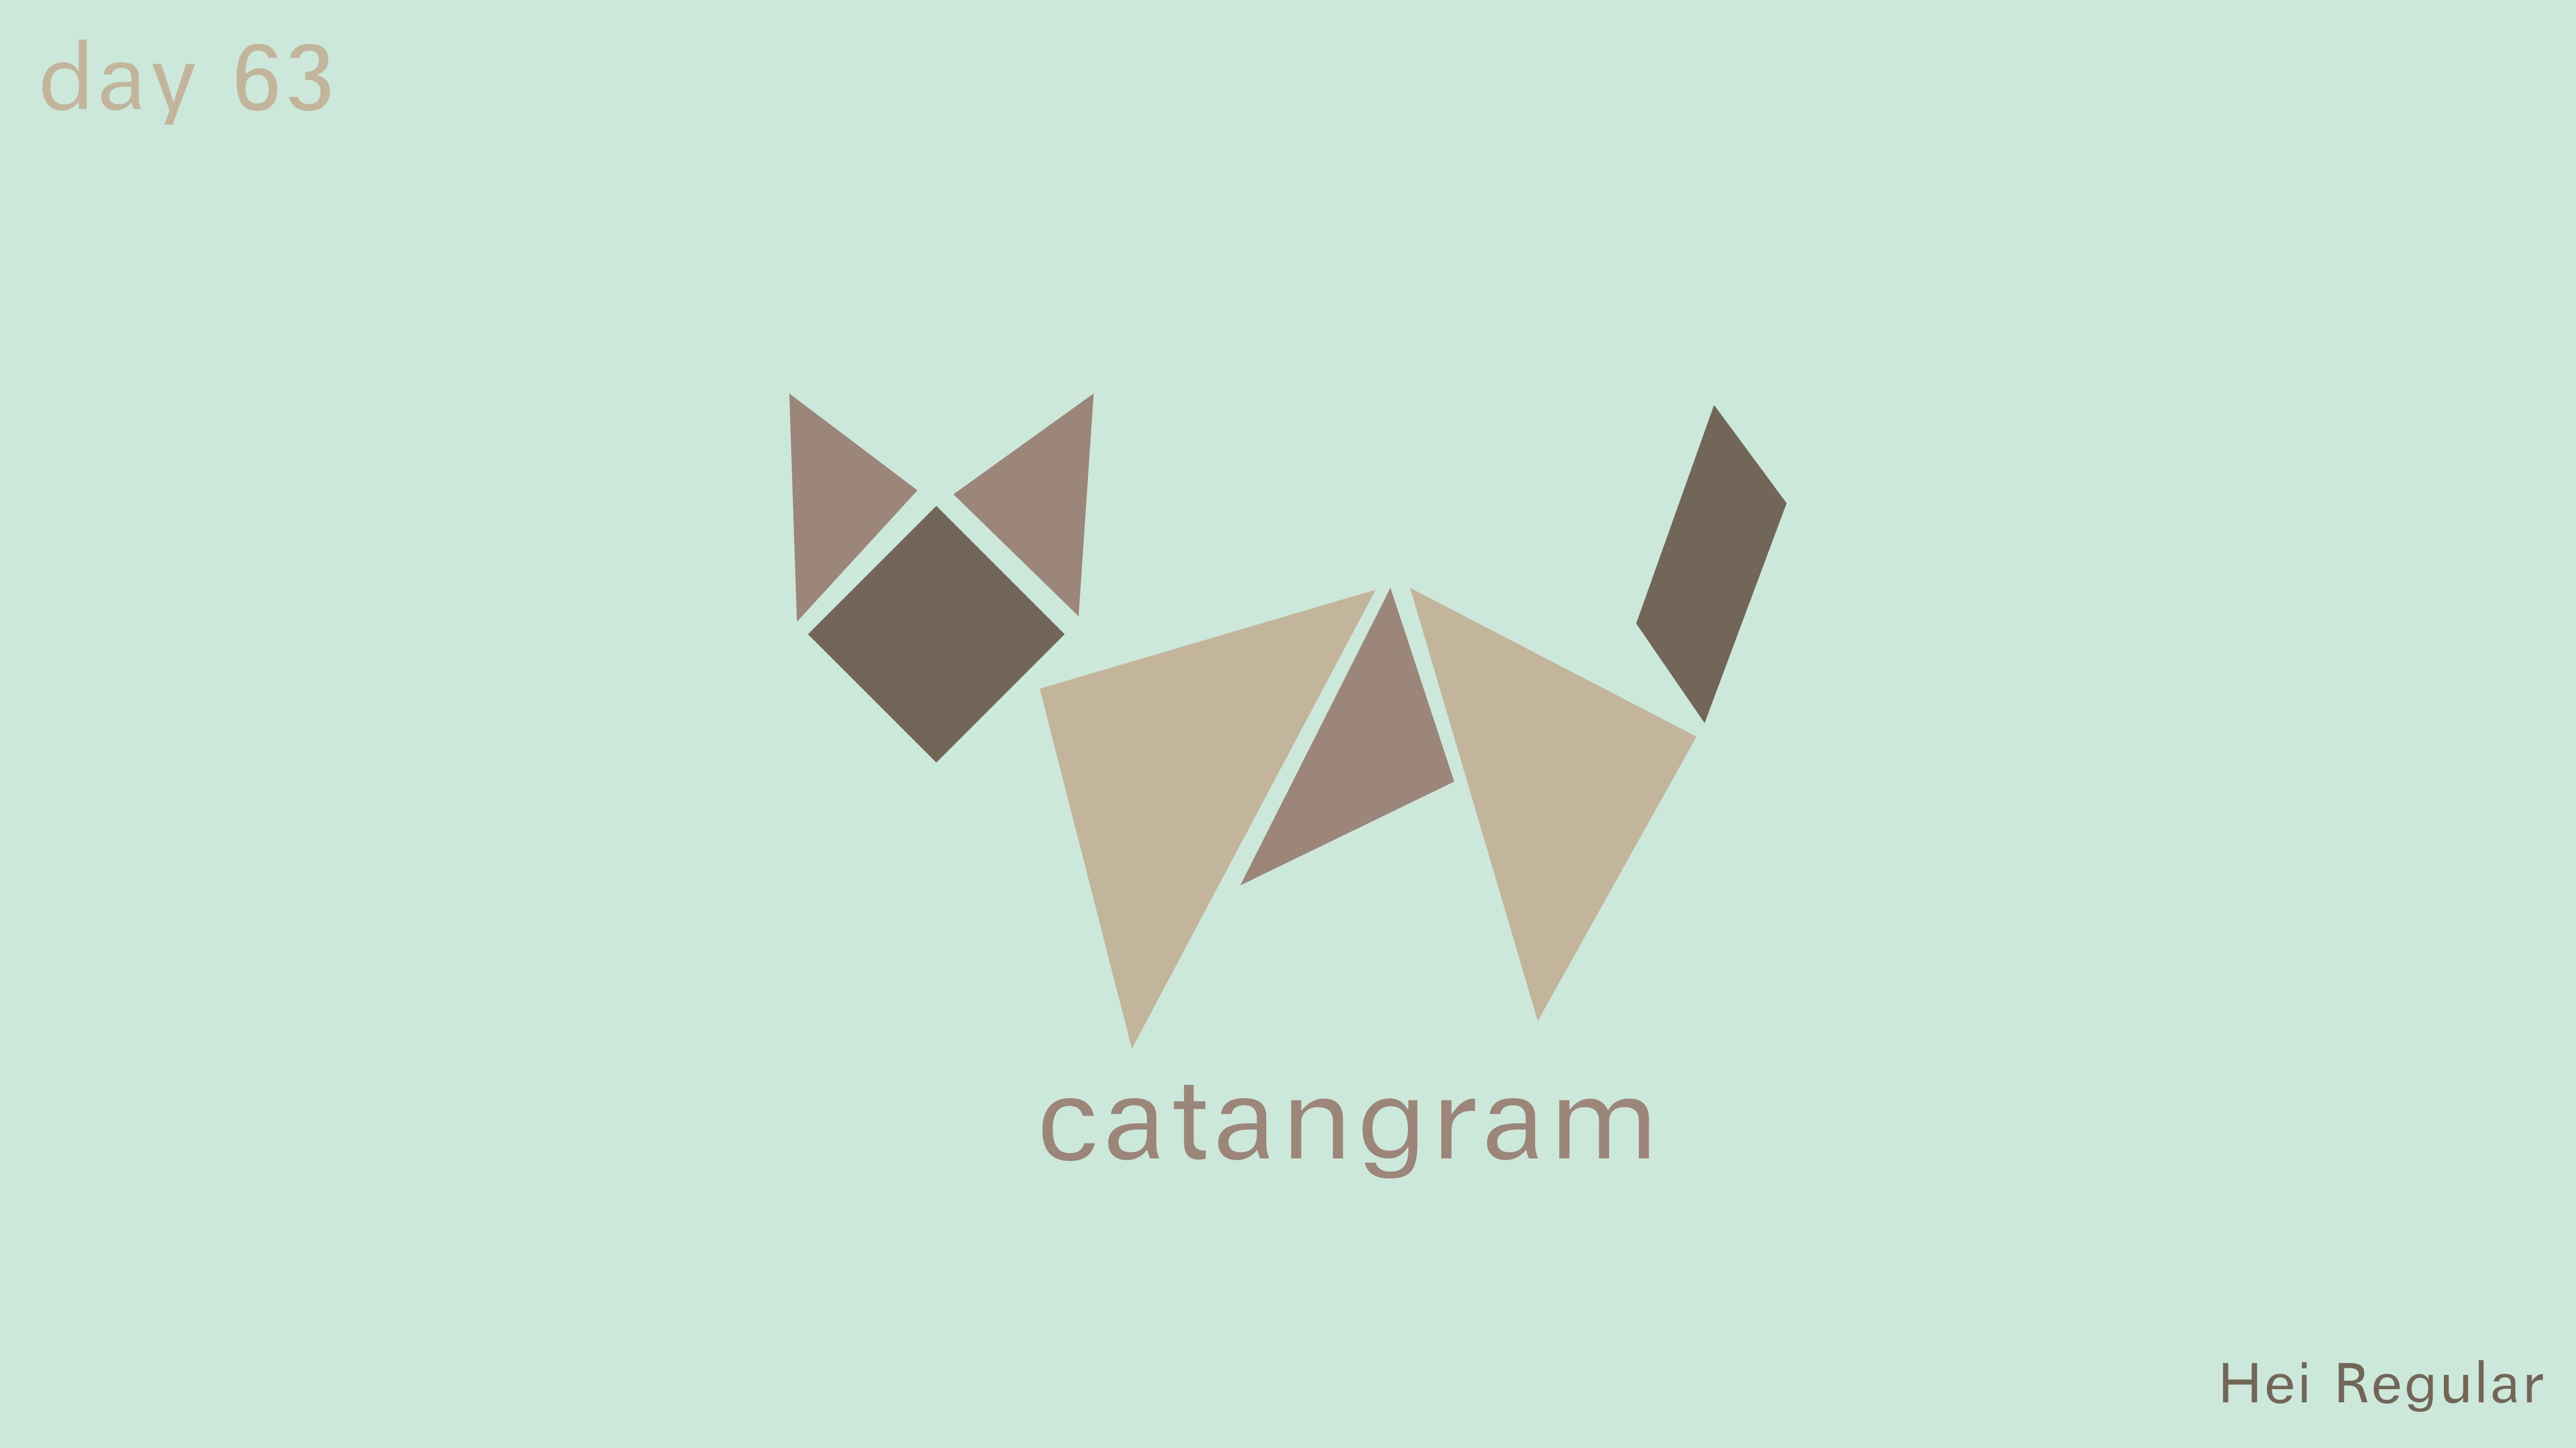 [cat]day6-03